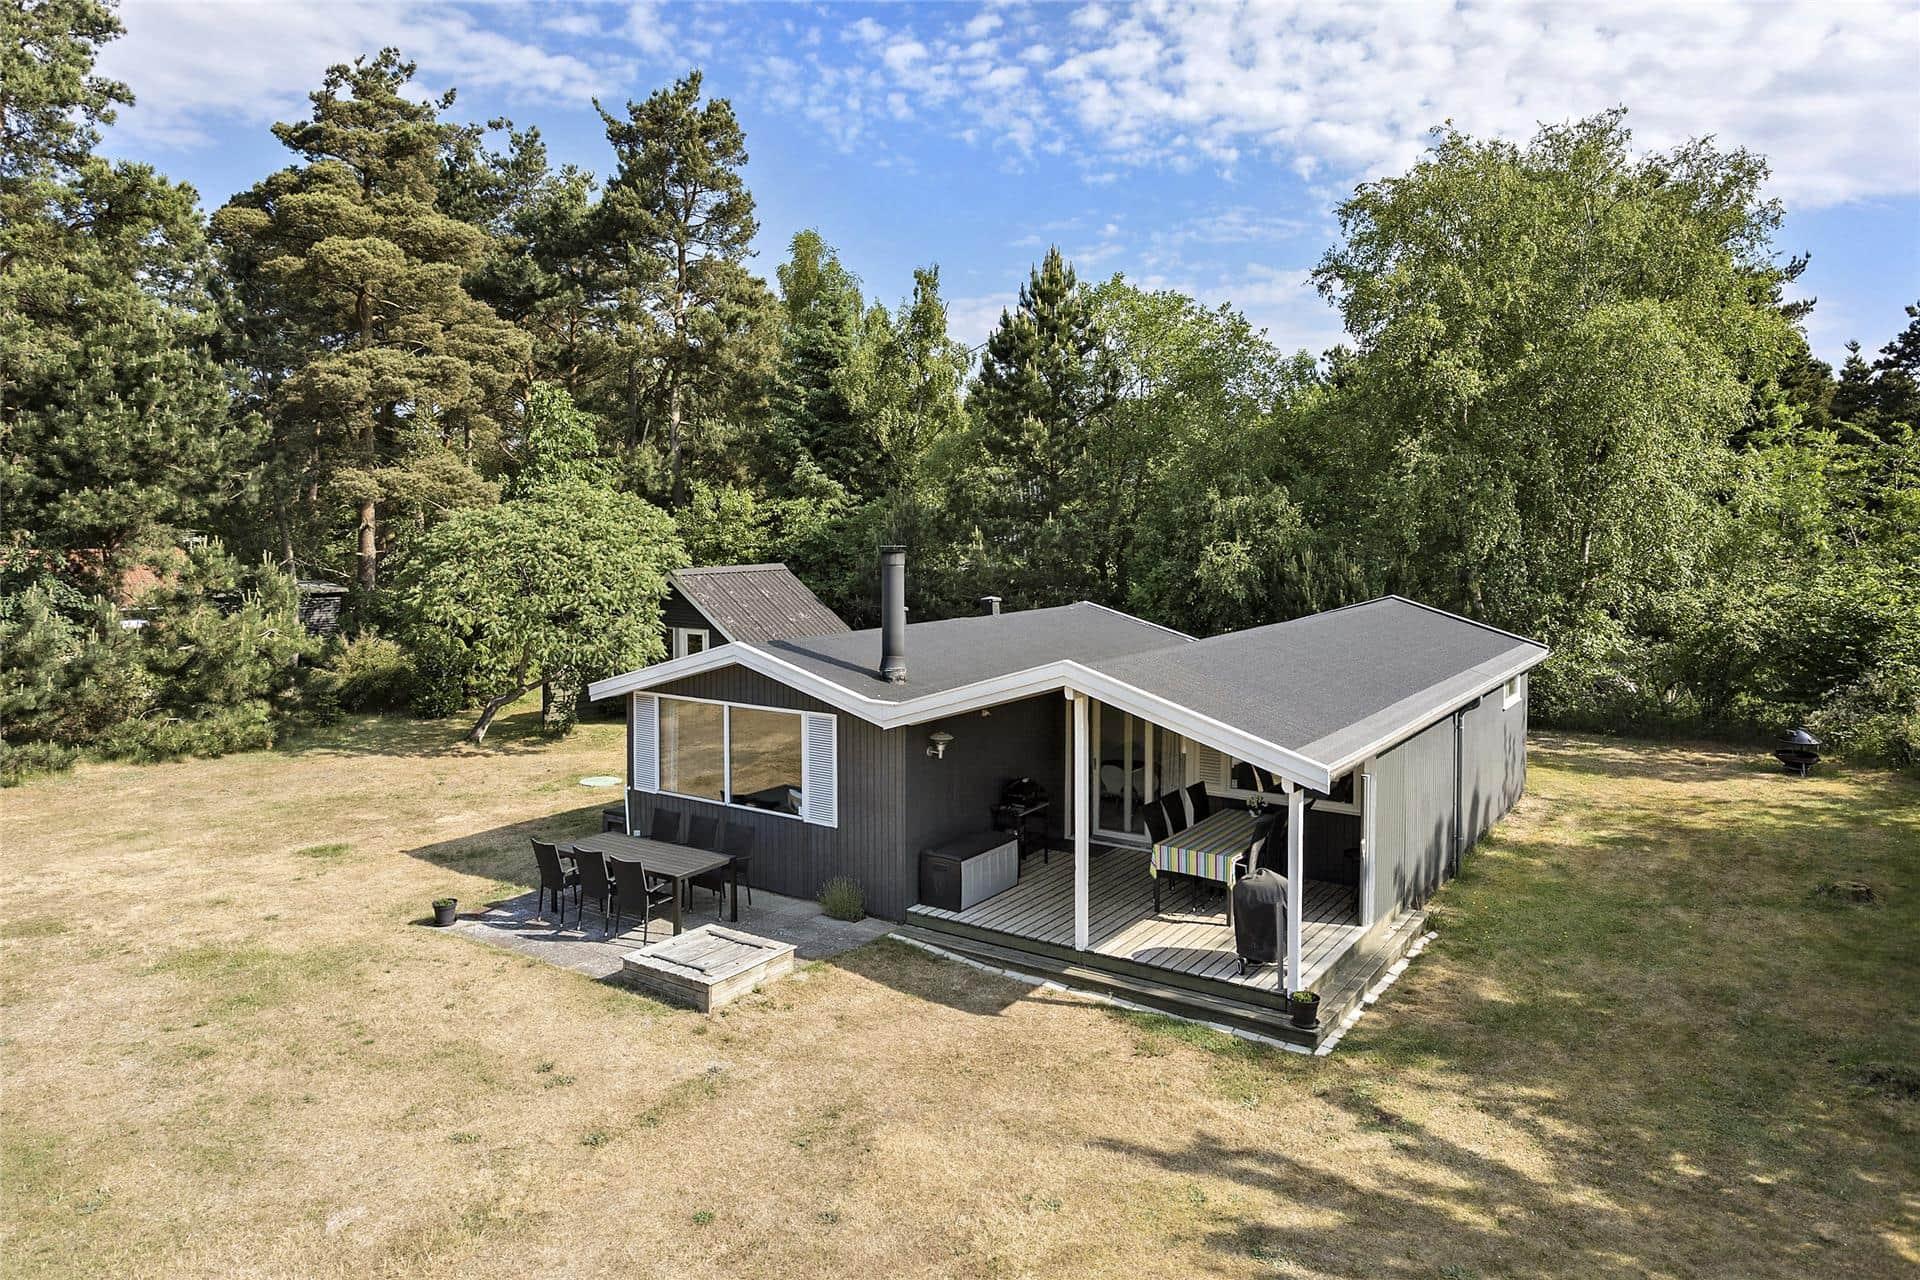 Billede 1-17 Sommerhus 11134, Laborantstien 9, DK - 4500 Nykøbing Sj